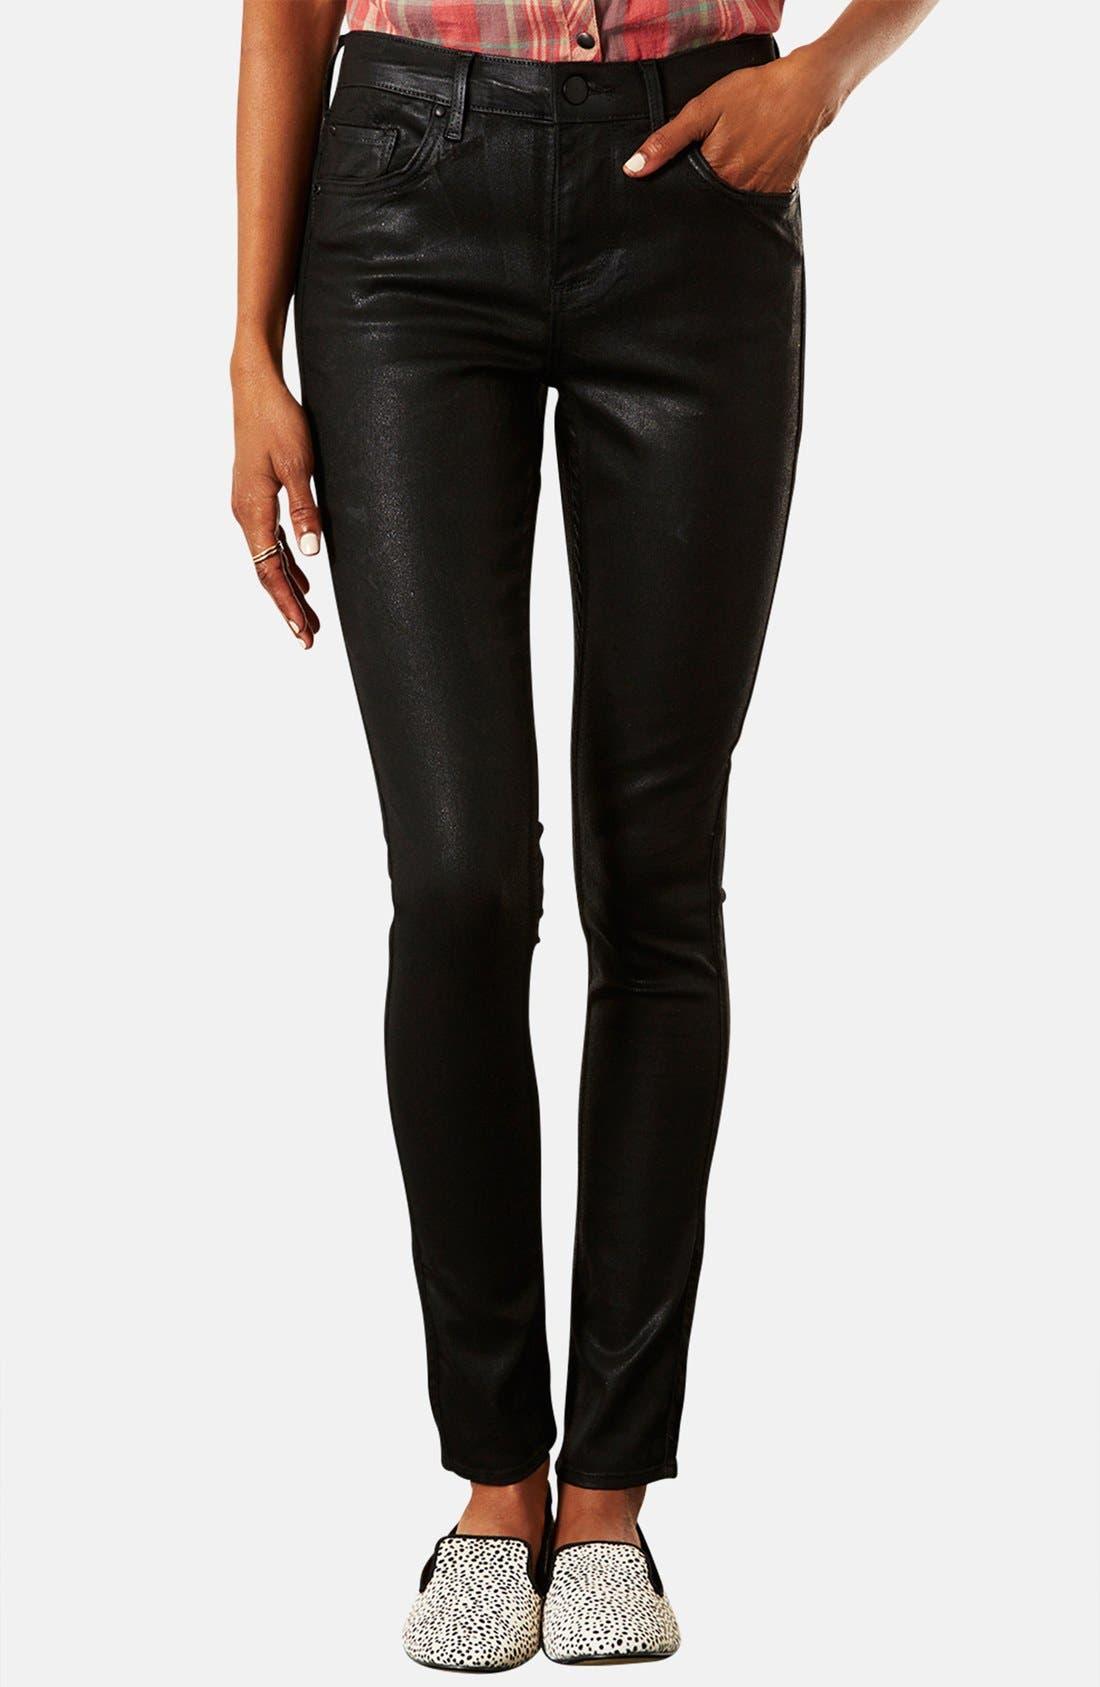 Main Image - Topshop Moto 'Leigh' Coated Skinny Jeans (Petite)